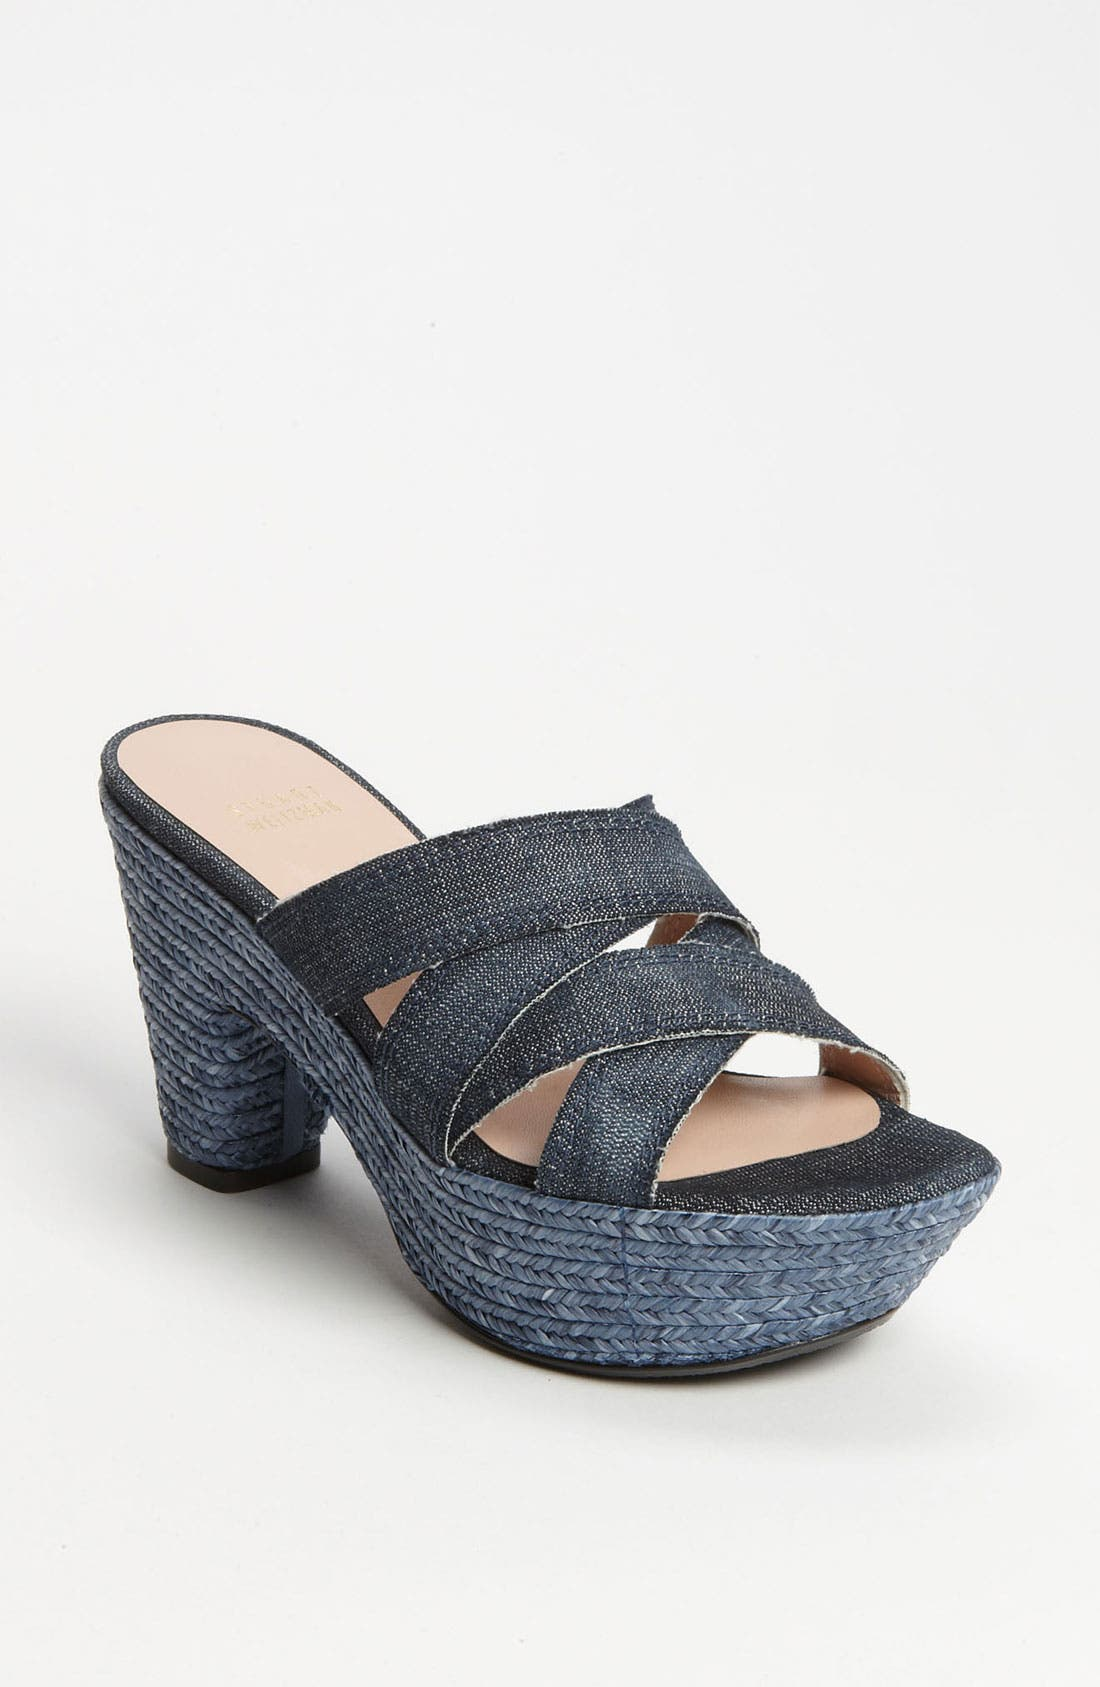 Main Image - Stuart Weitzman 'Sliderules' Sandal